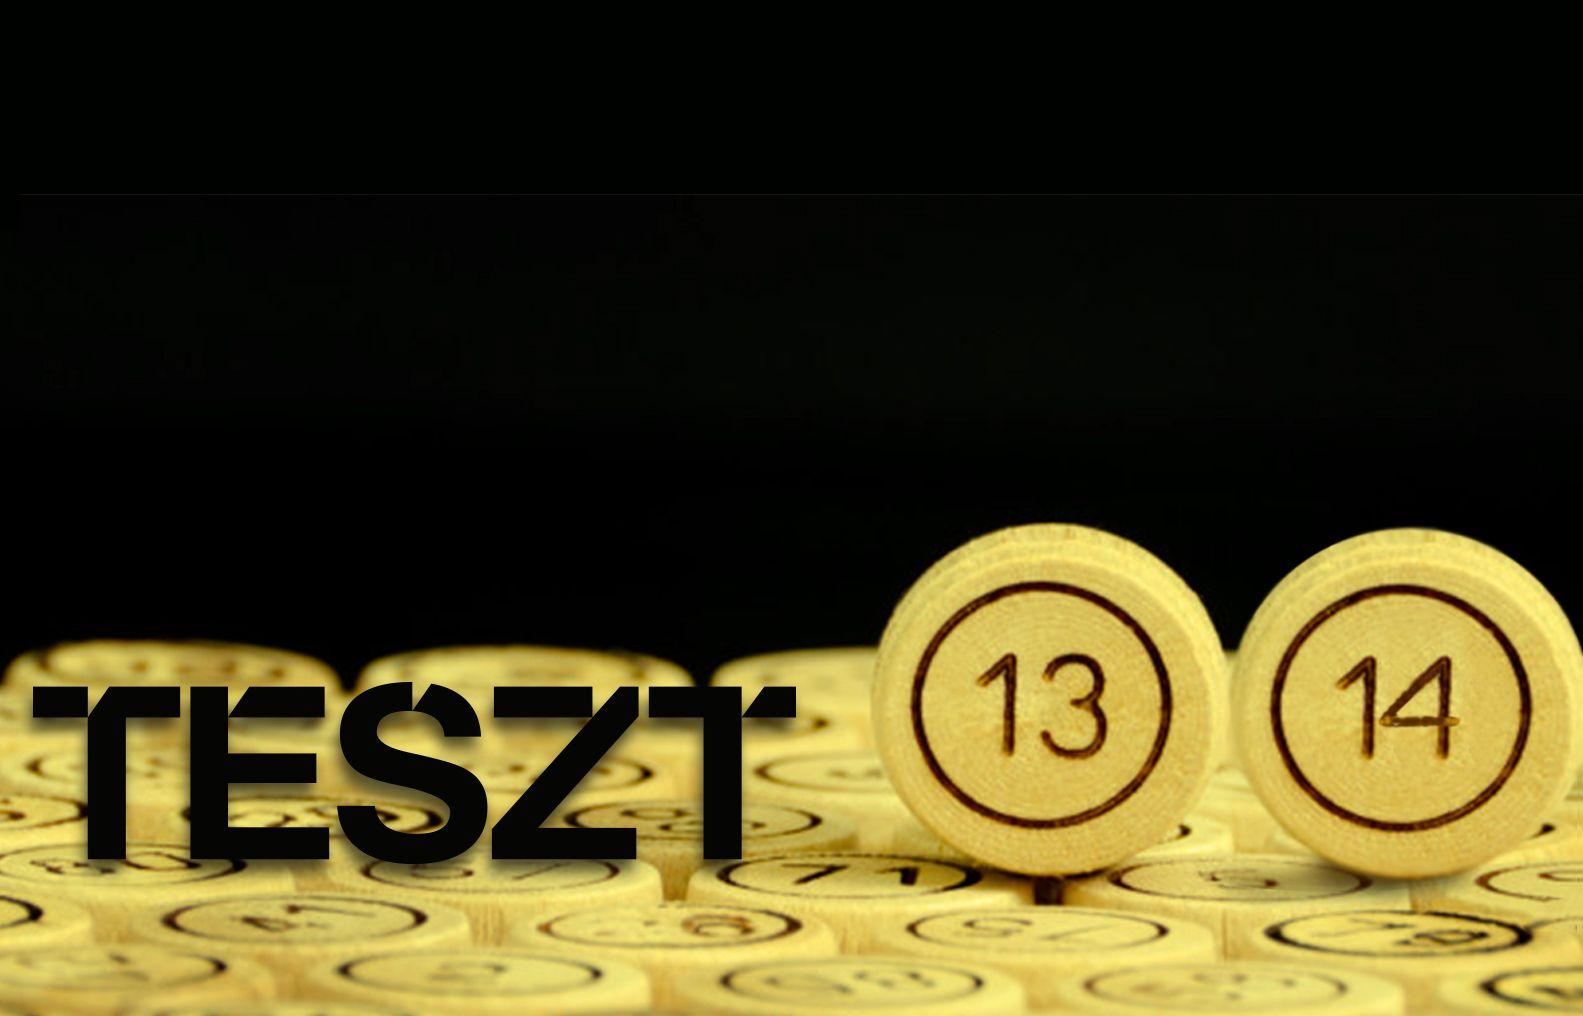 TESZT #13 se anulează